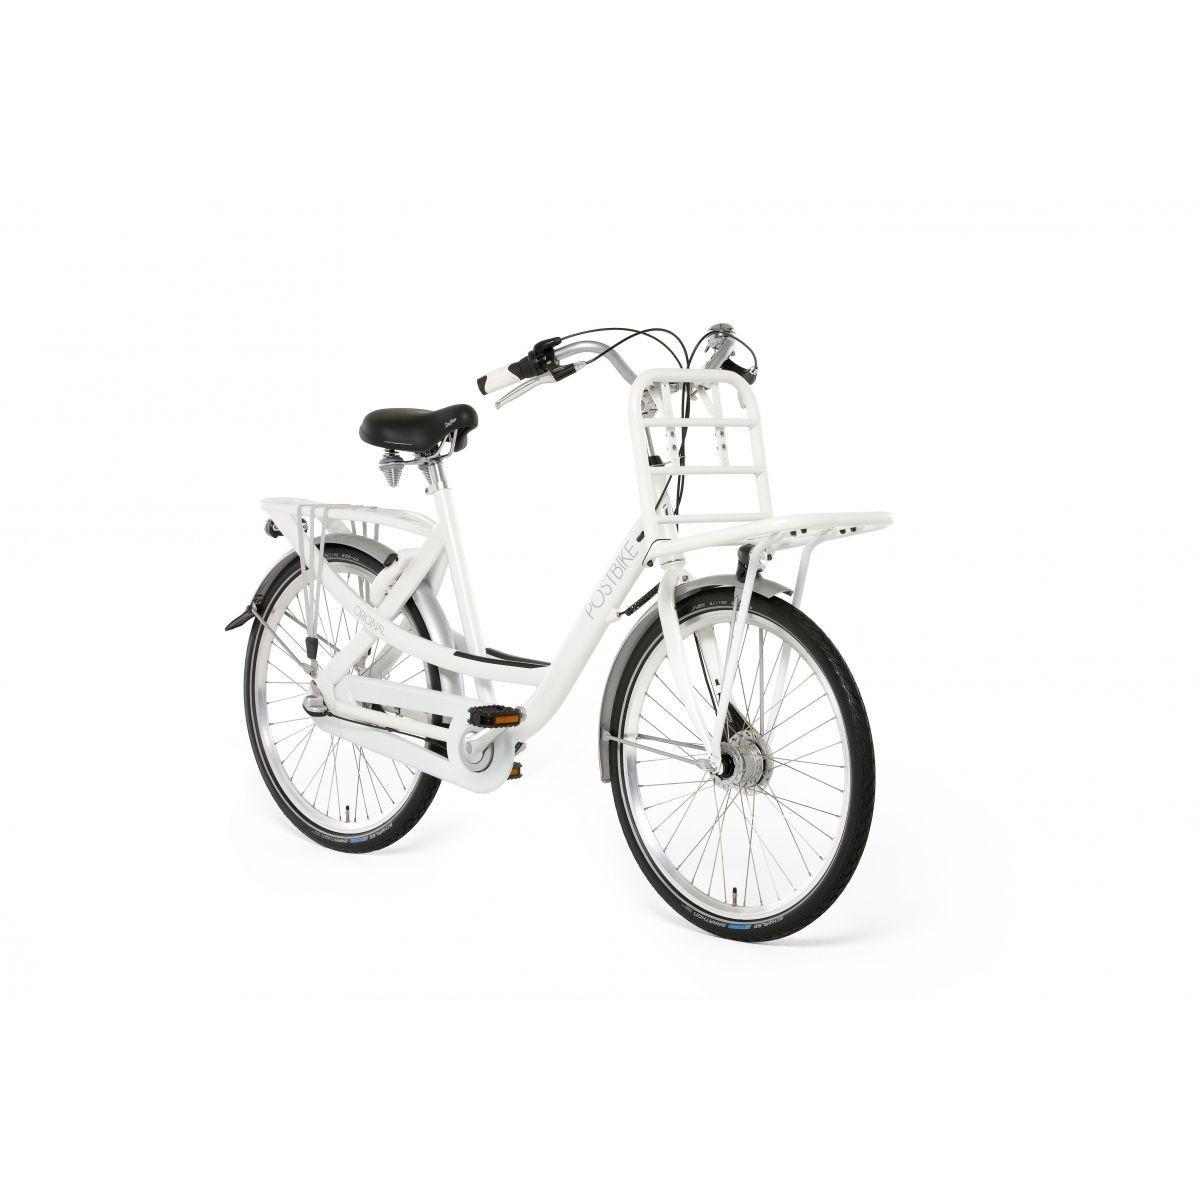 postbike original wit